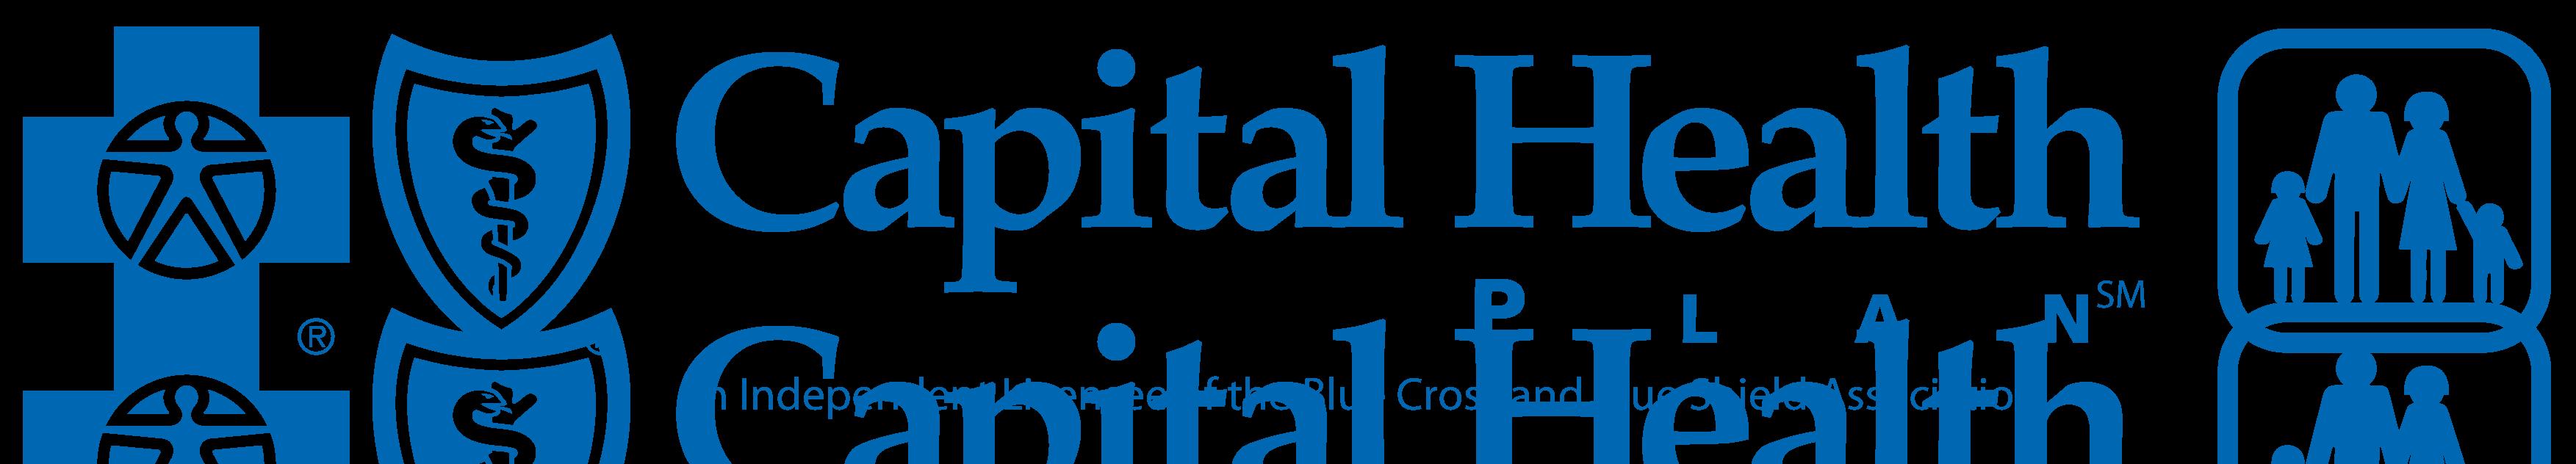 Capital Health Plan Logo